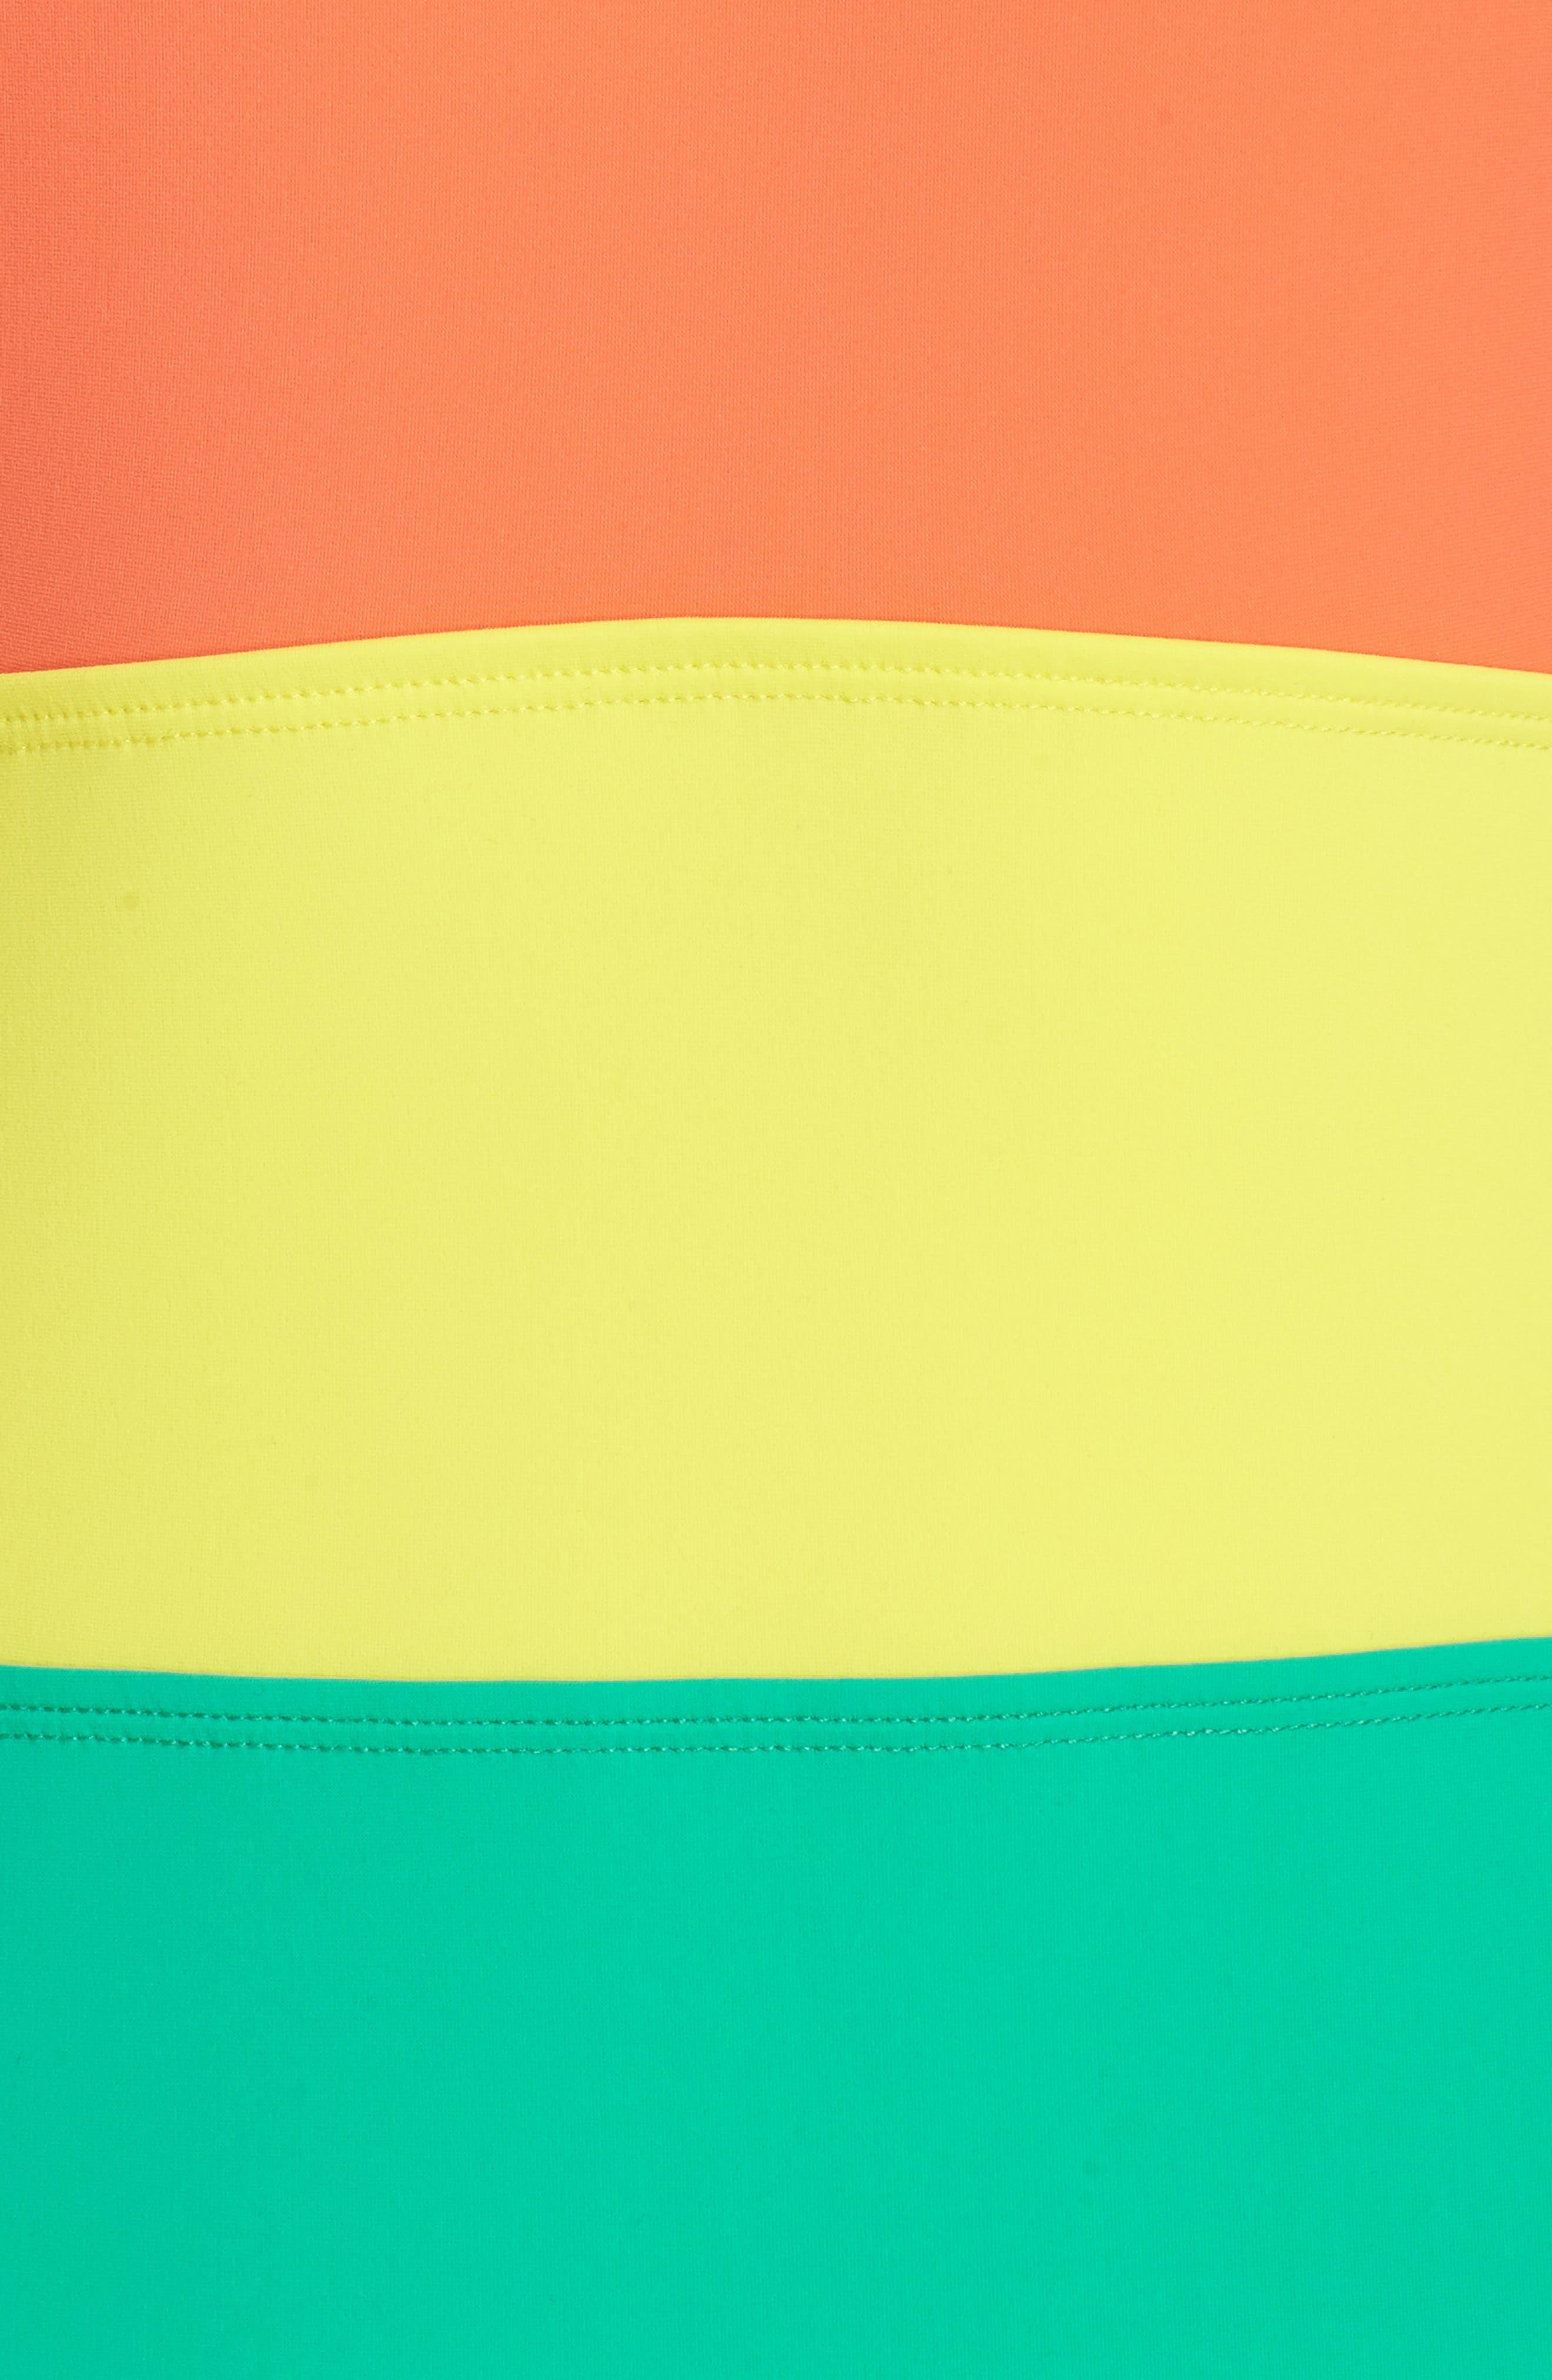 Halter One-Piece Swimsuit,                             Alternate thumbnail 5, color,                             Coral/ Acid